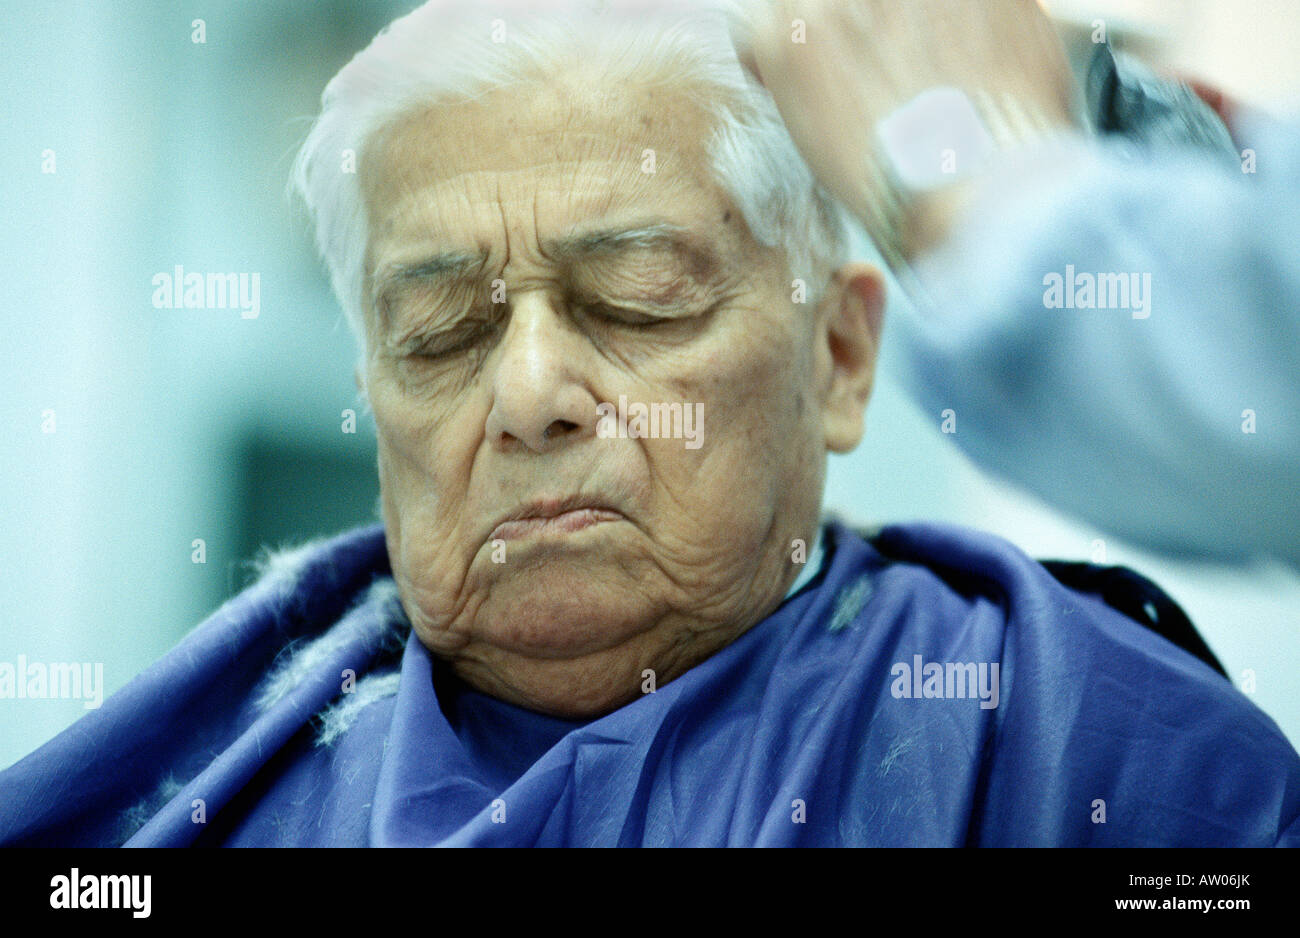 Elderly Man having a Haircut - Stock Image